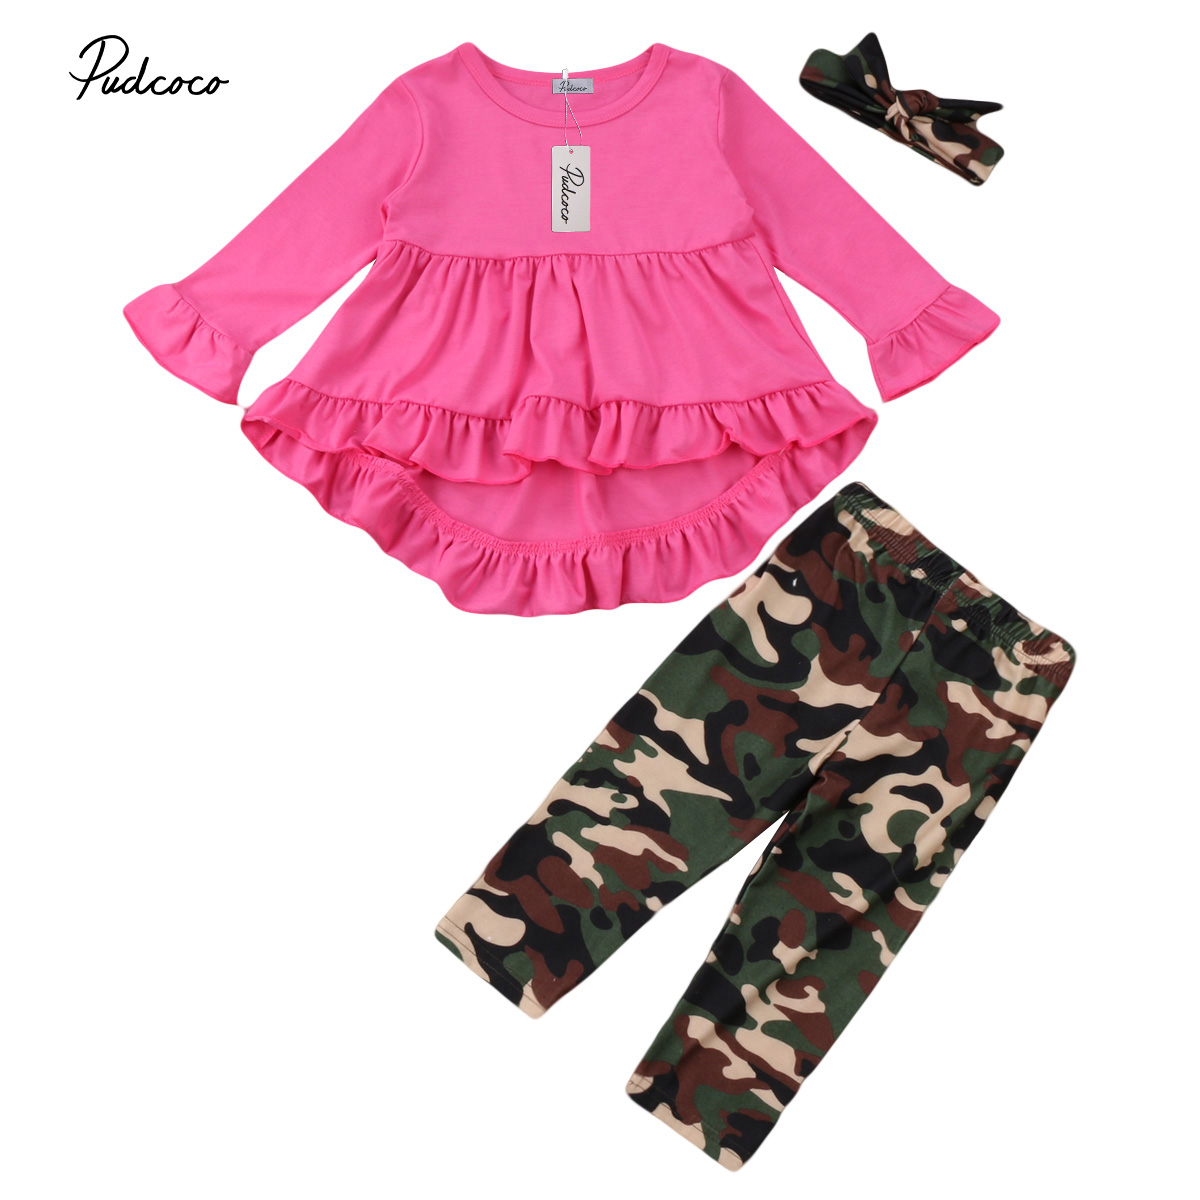 Christmas Little Girls Dress Pants Headband Clothing Set Kids Baby Girl Camo Outfits Clothes Top Dresses+Camoflage Pants Set